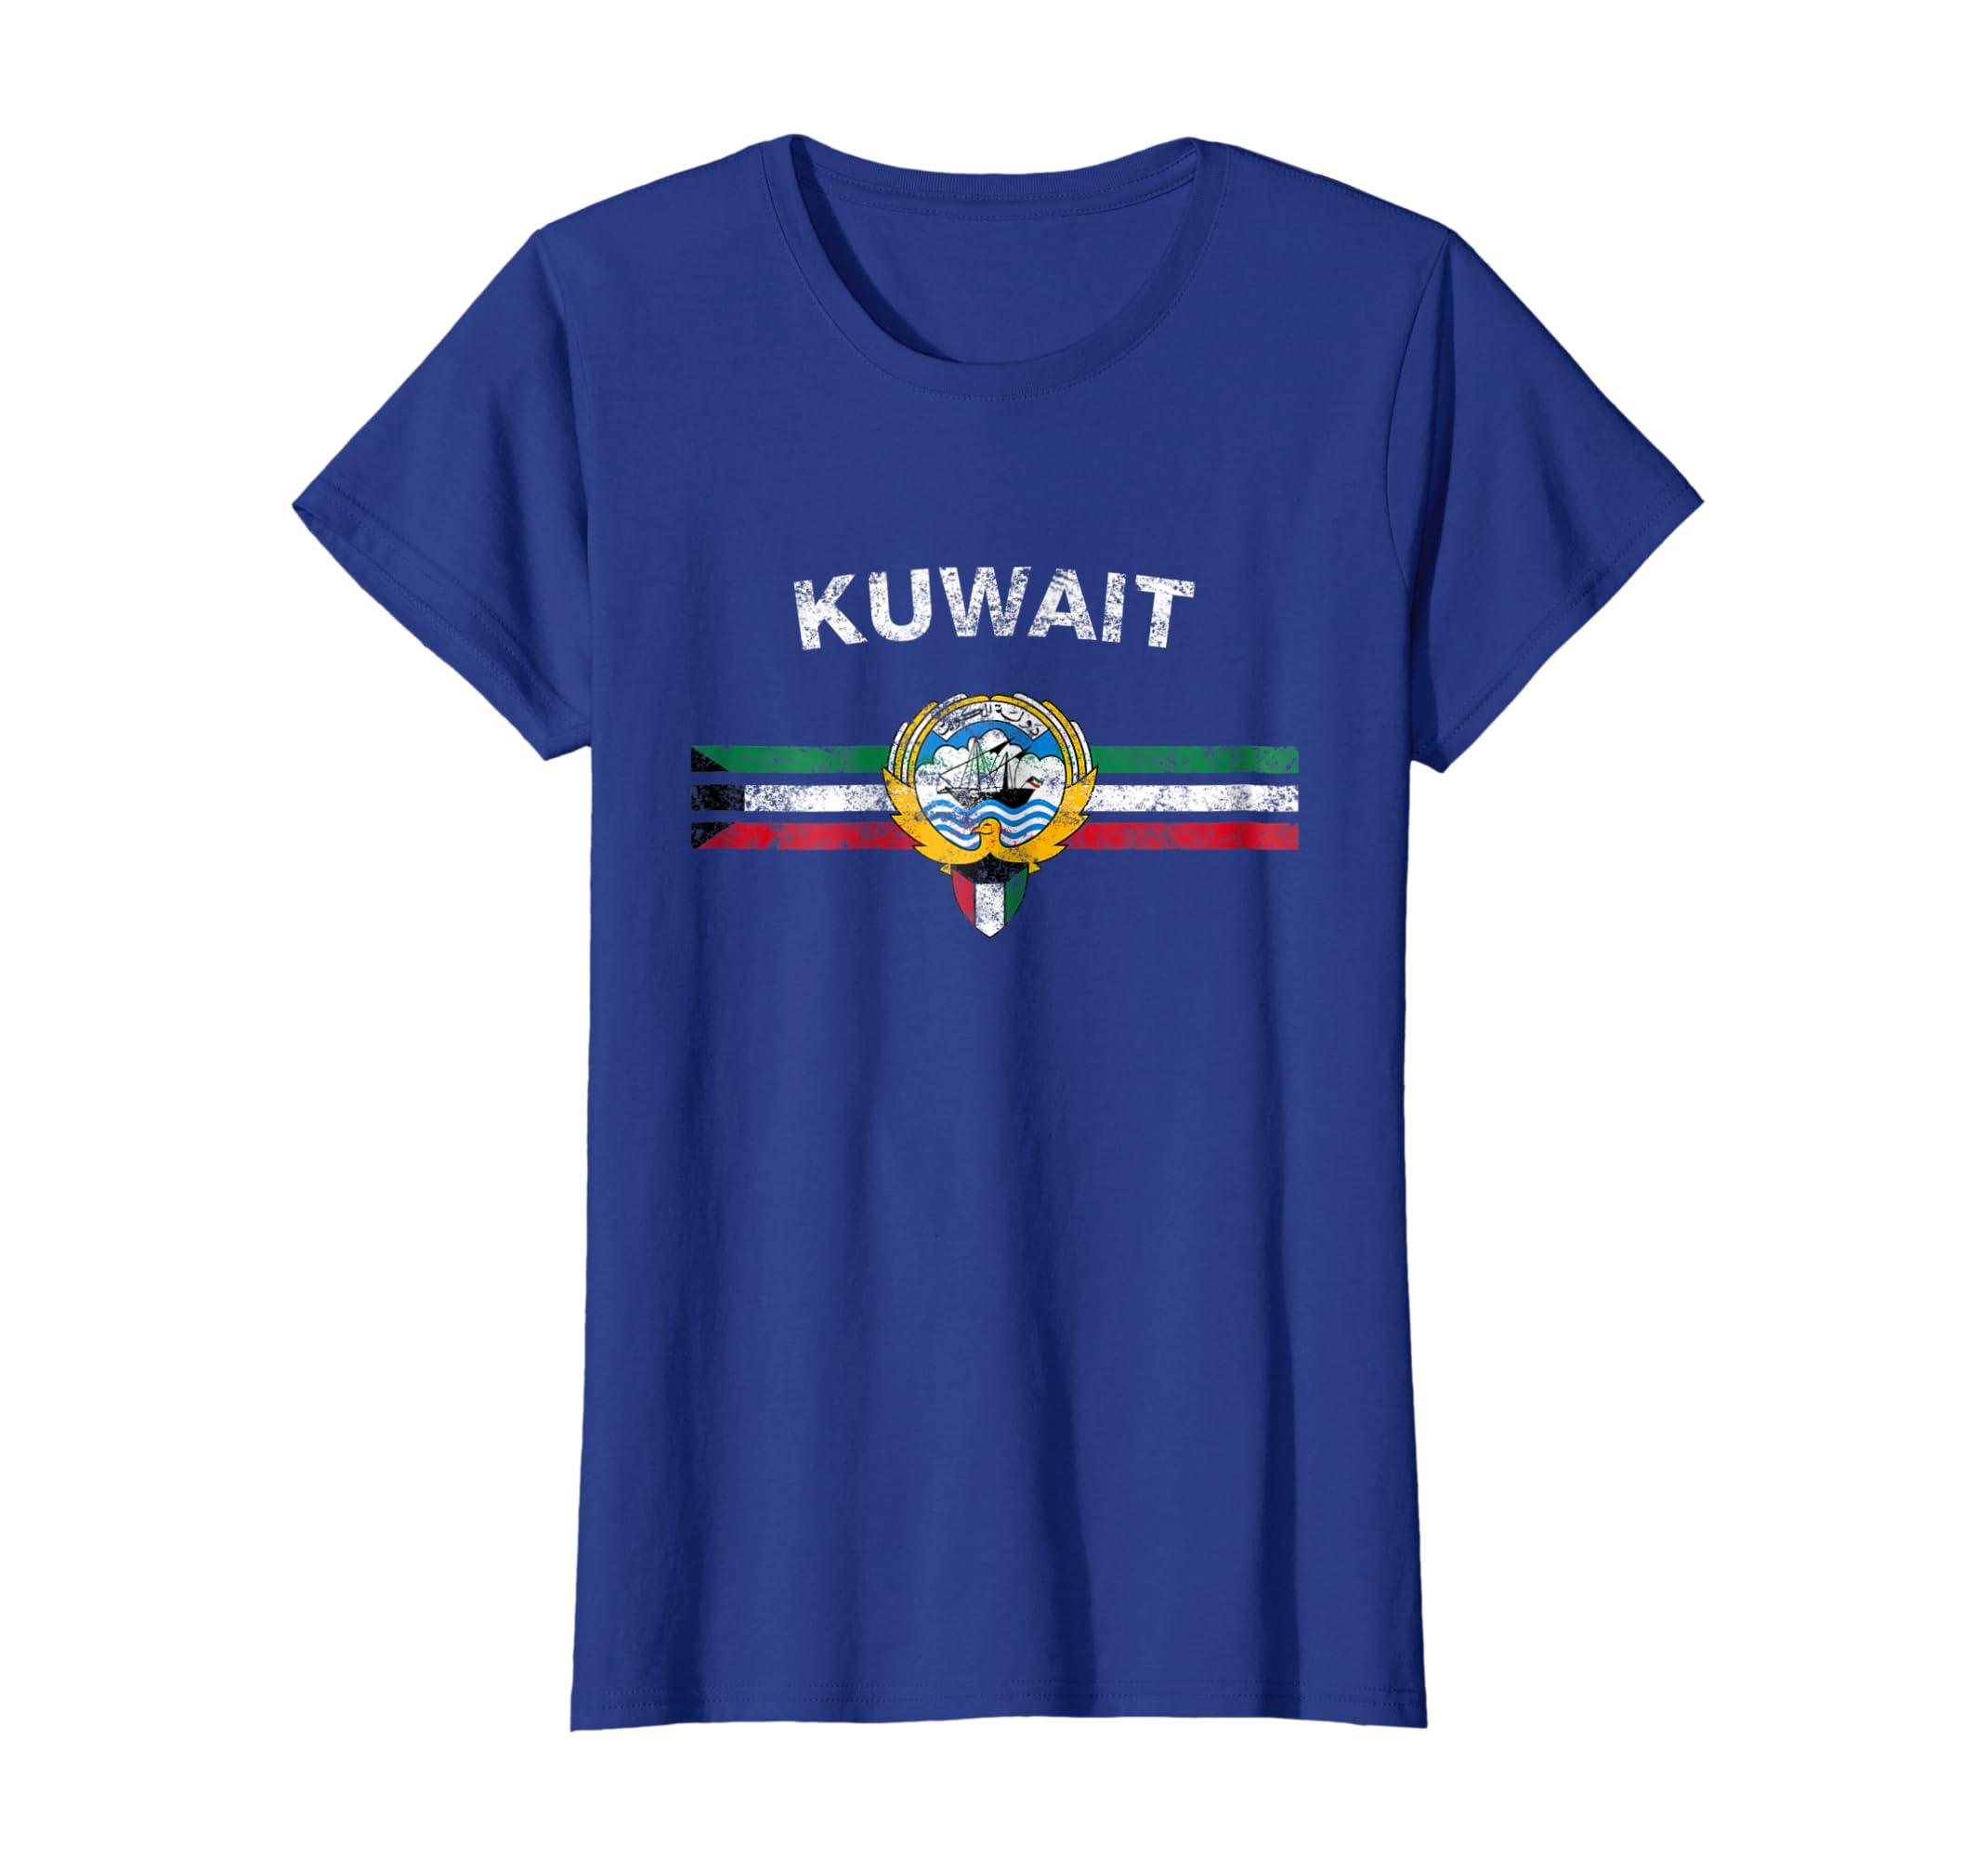 76ba8e2e2ff3 Amazon.com  Kuwaiti Flag Shirt - Kuwaiti Emblem   Kuwait Flag Shirt   Clothing